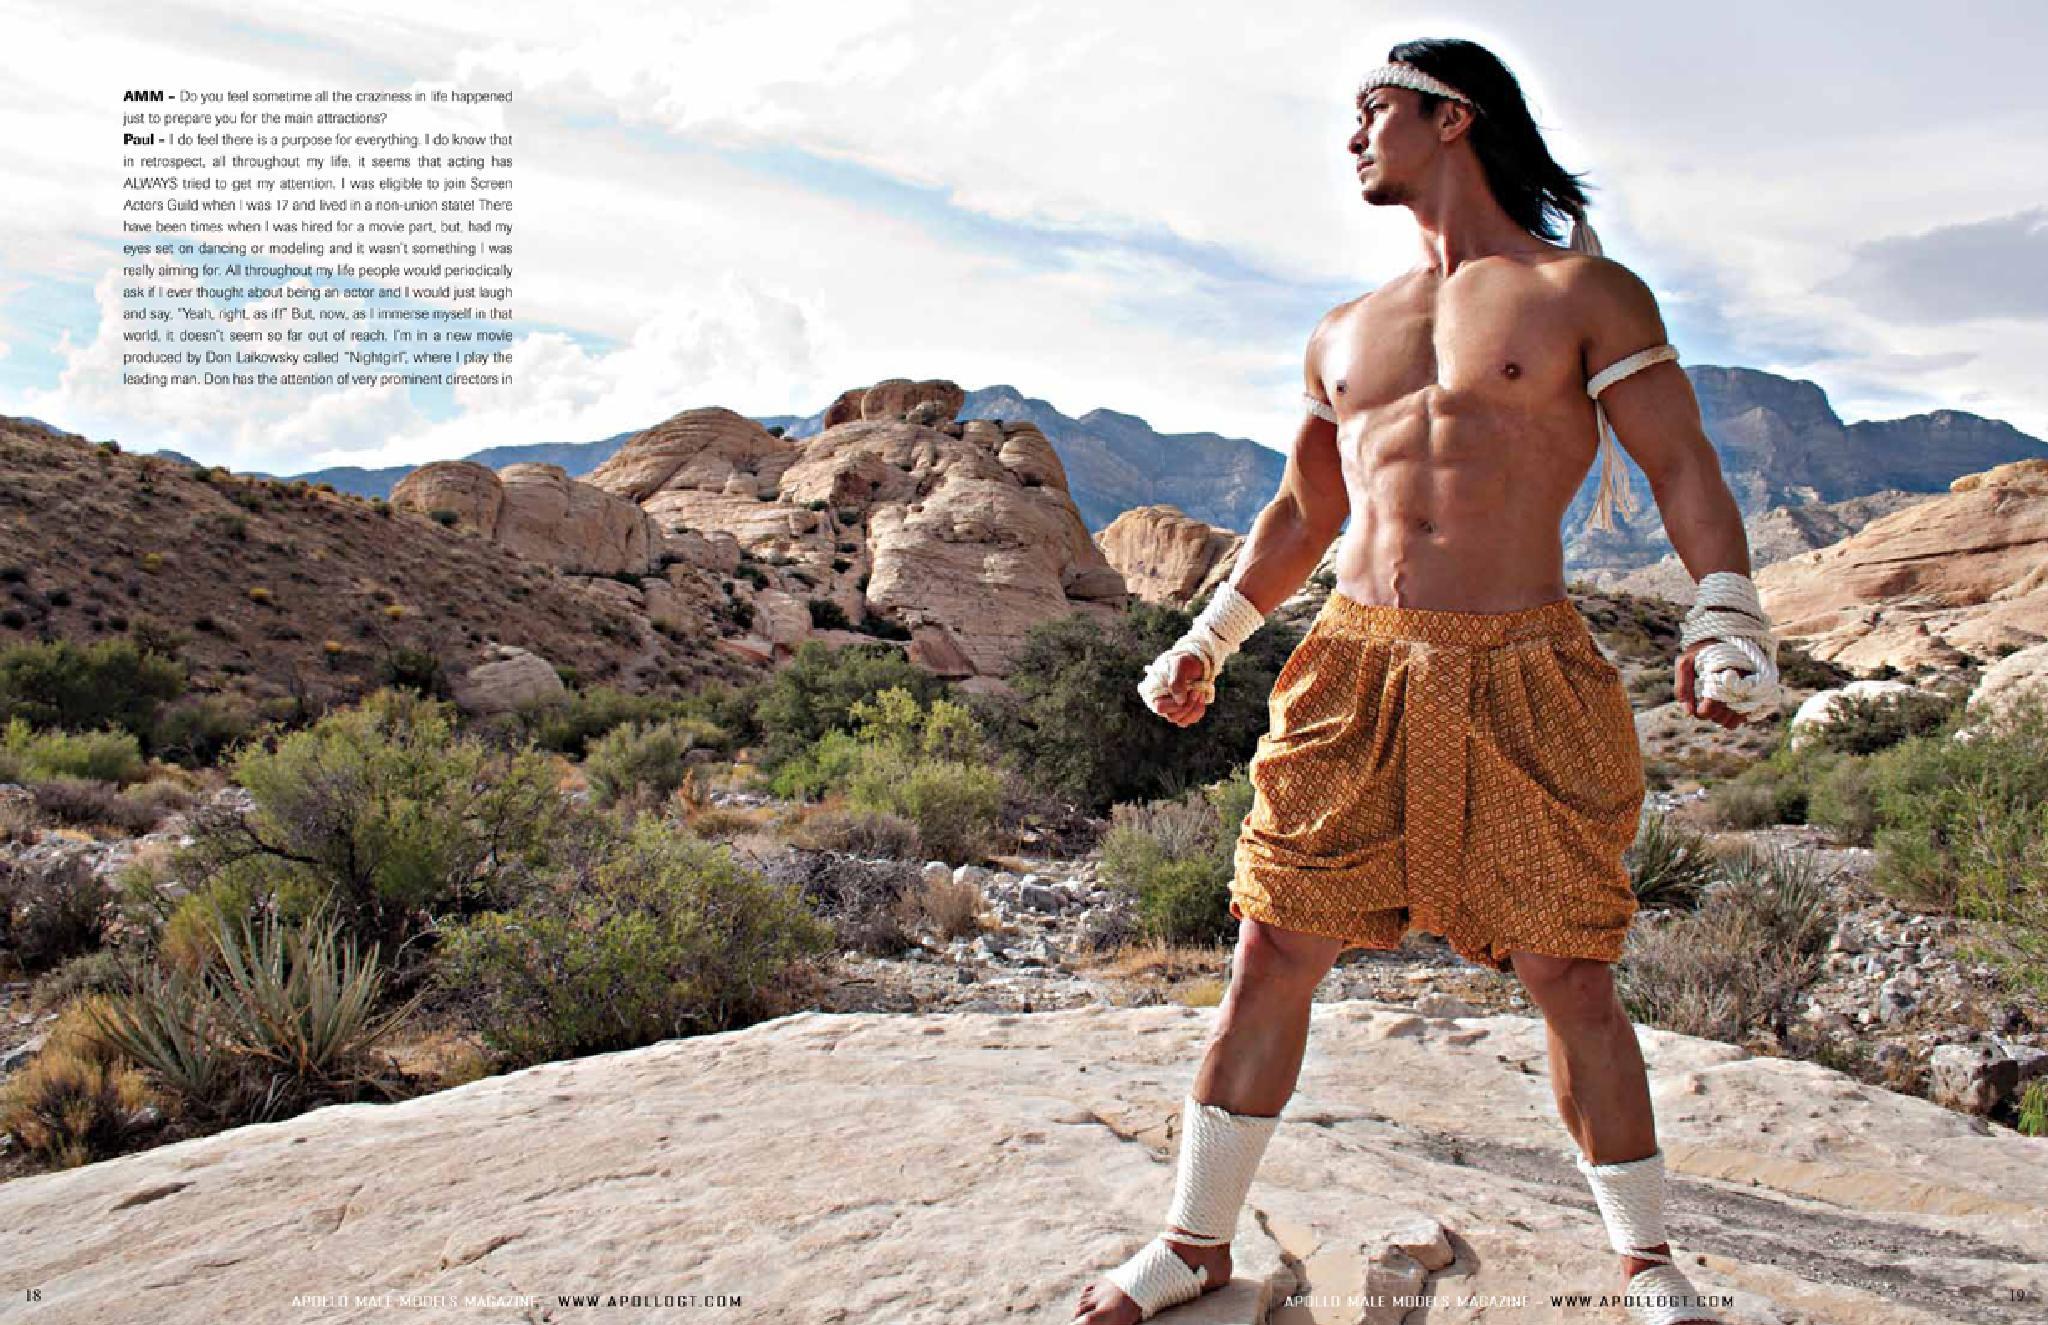 Apollo Male Models Magazine - cover model Paul Gunn by ApolloGT